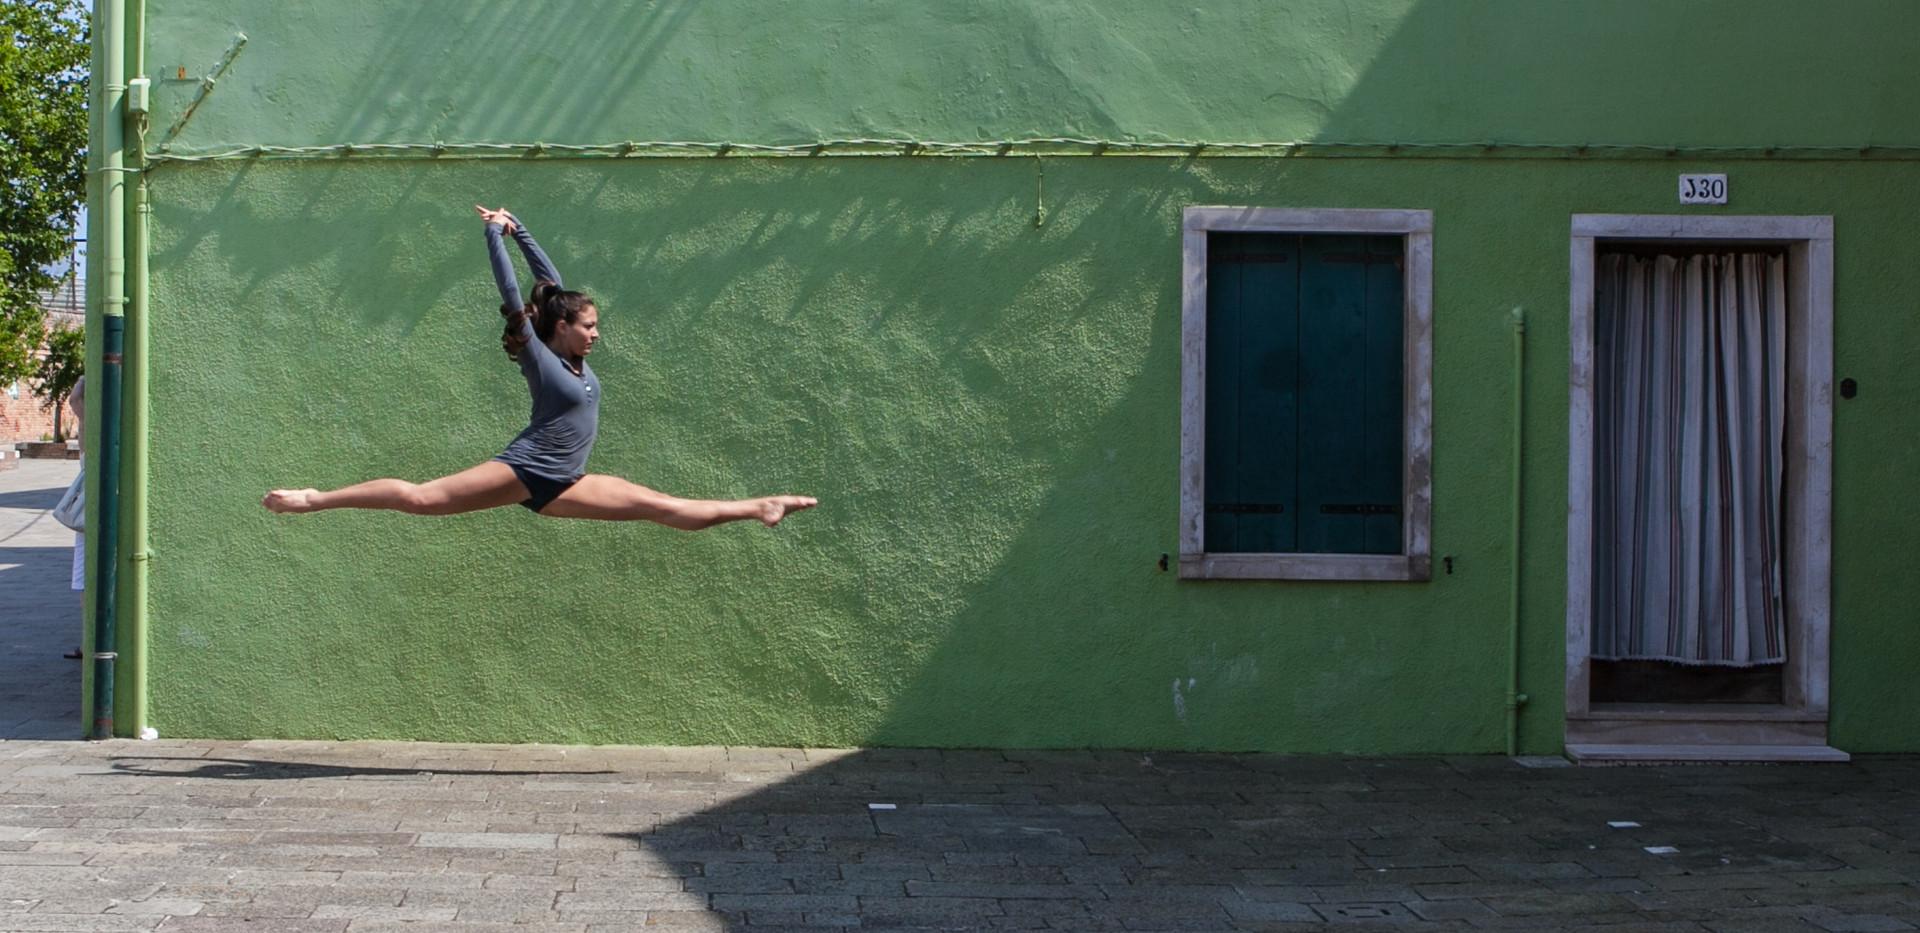 Ballerina-Project-3.jpg